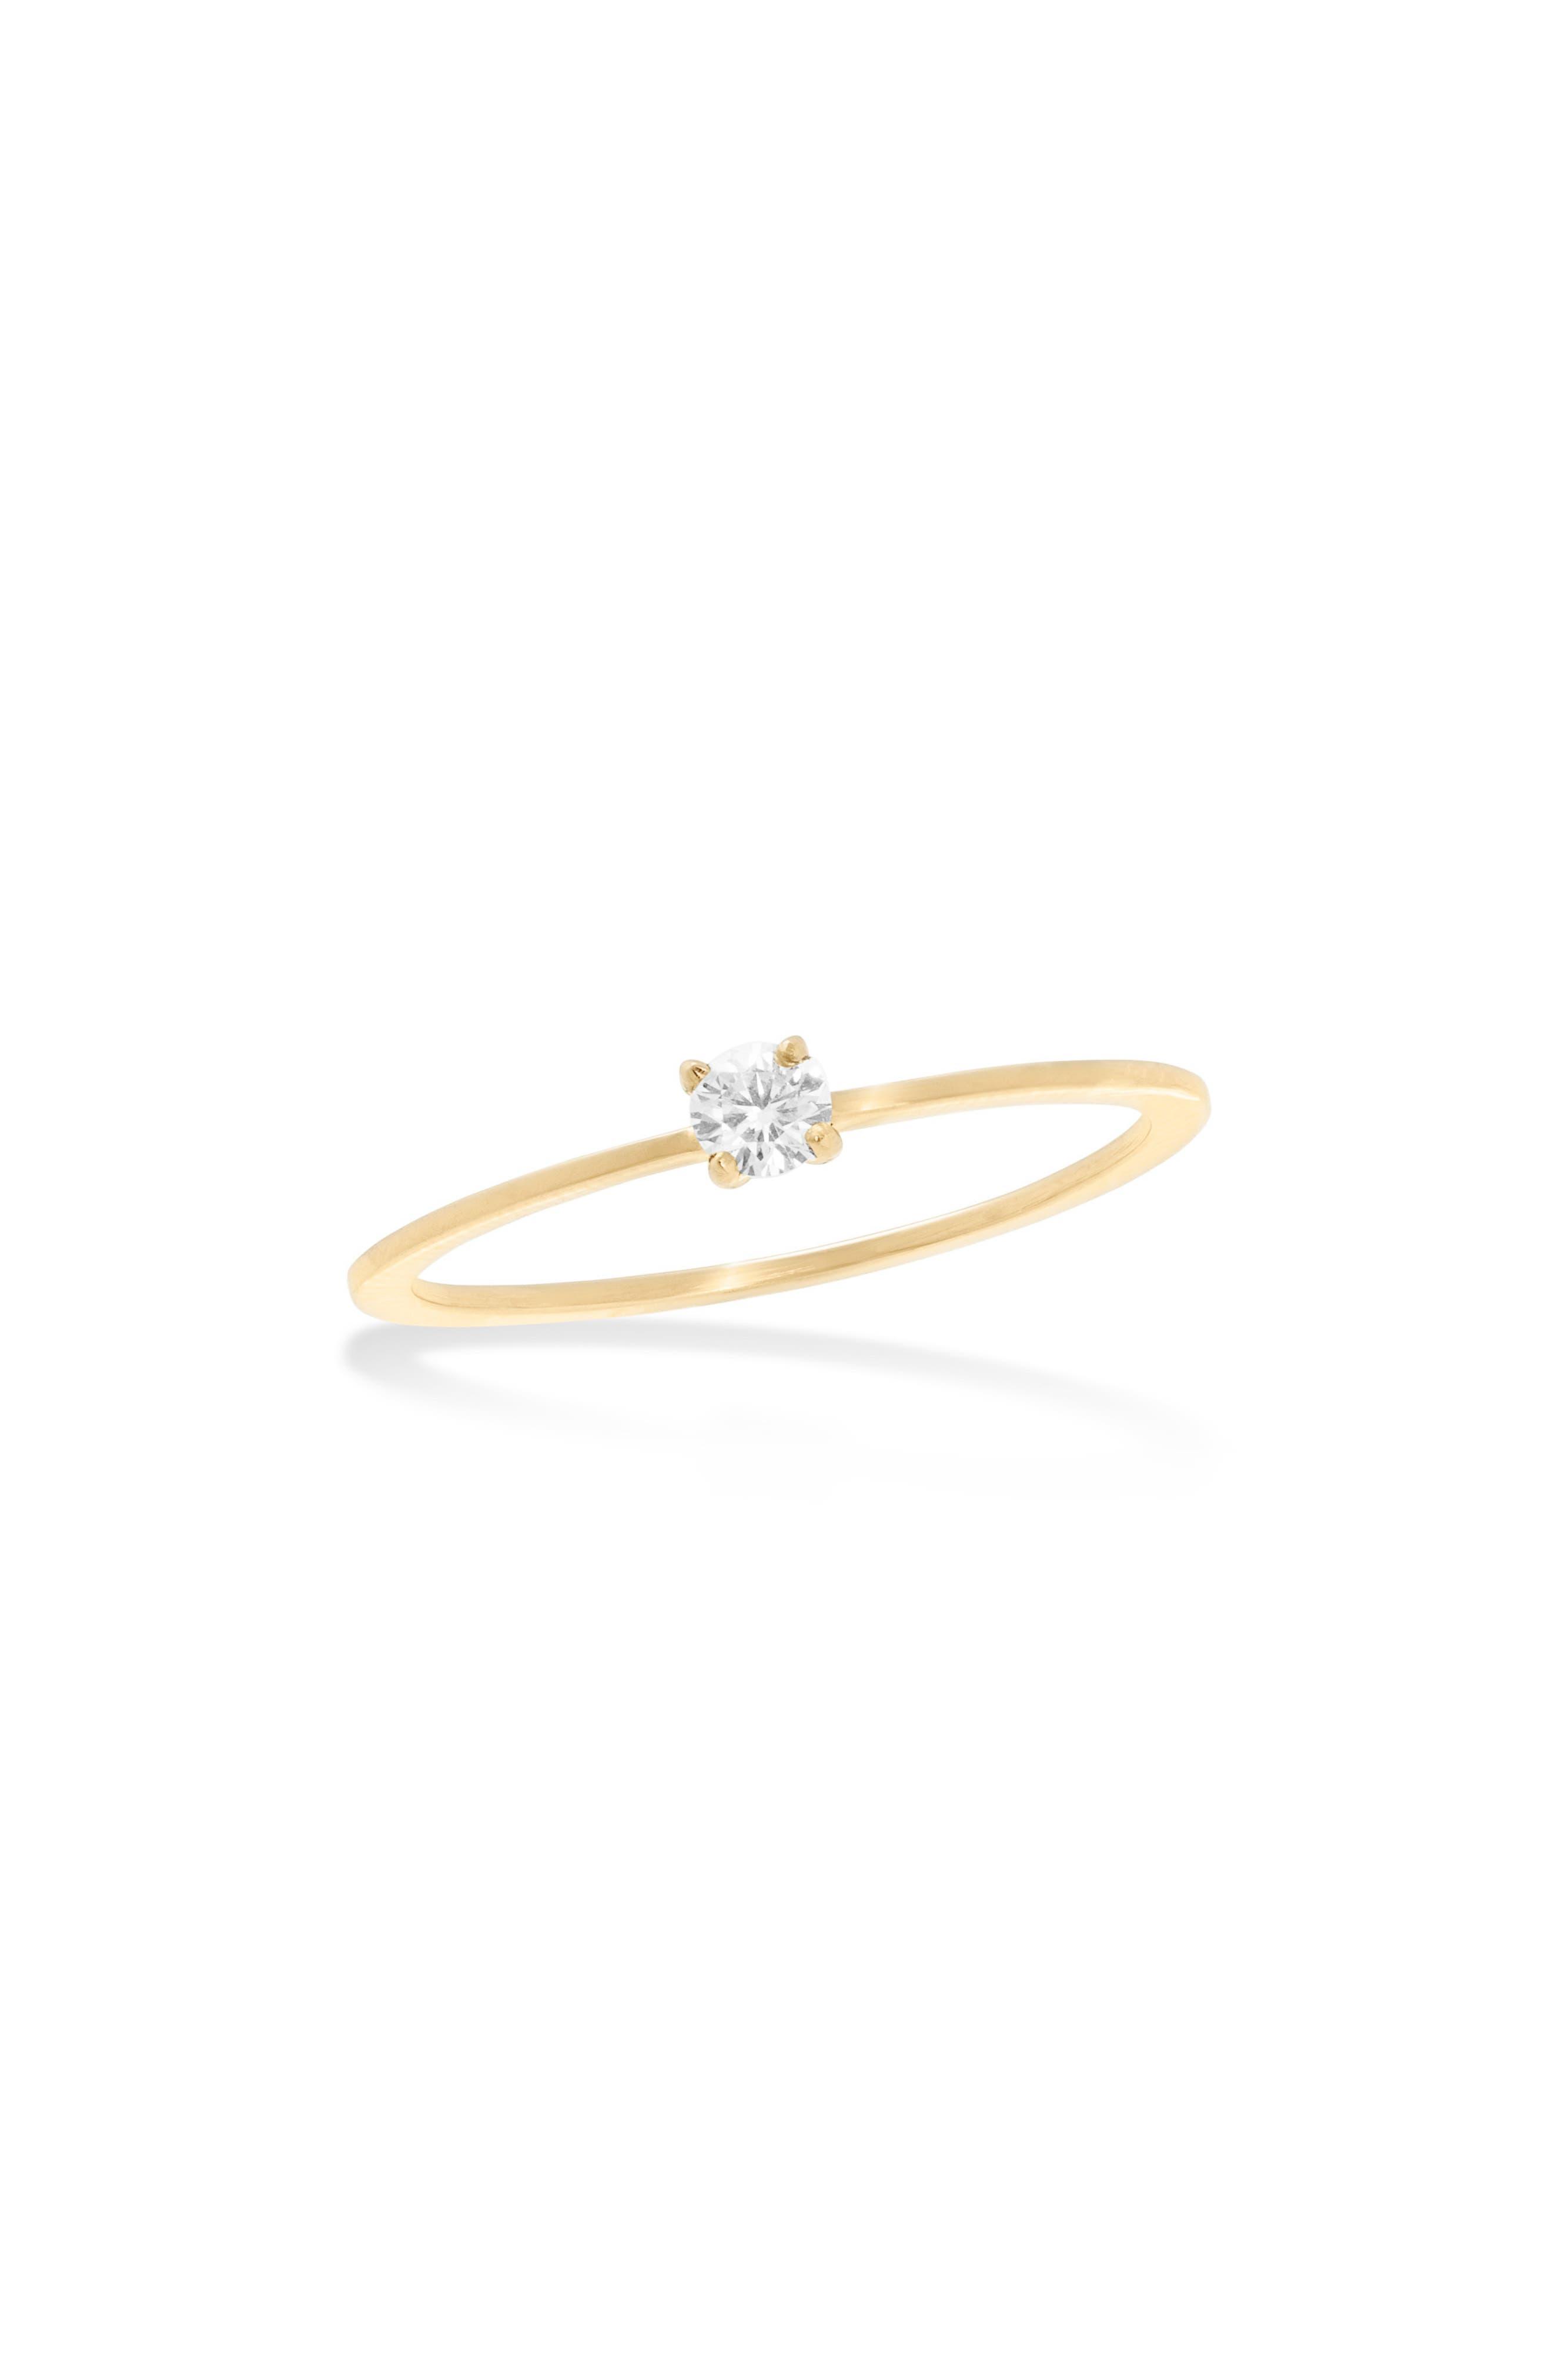 Skinny Flat Solo Diamond Ring